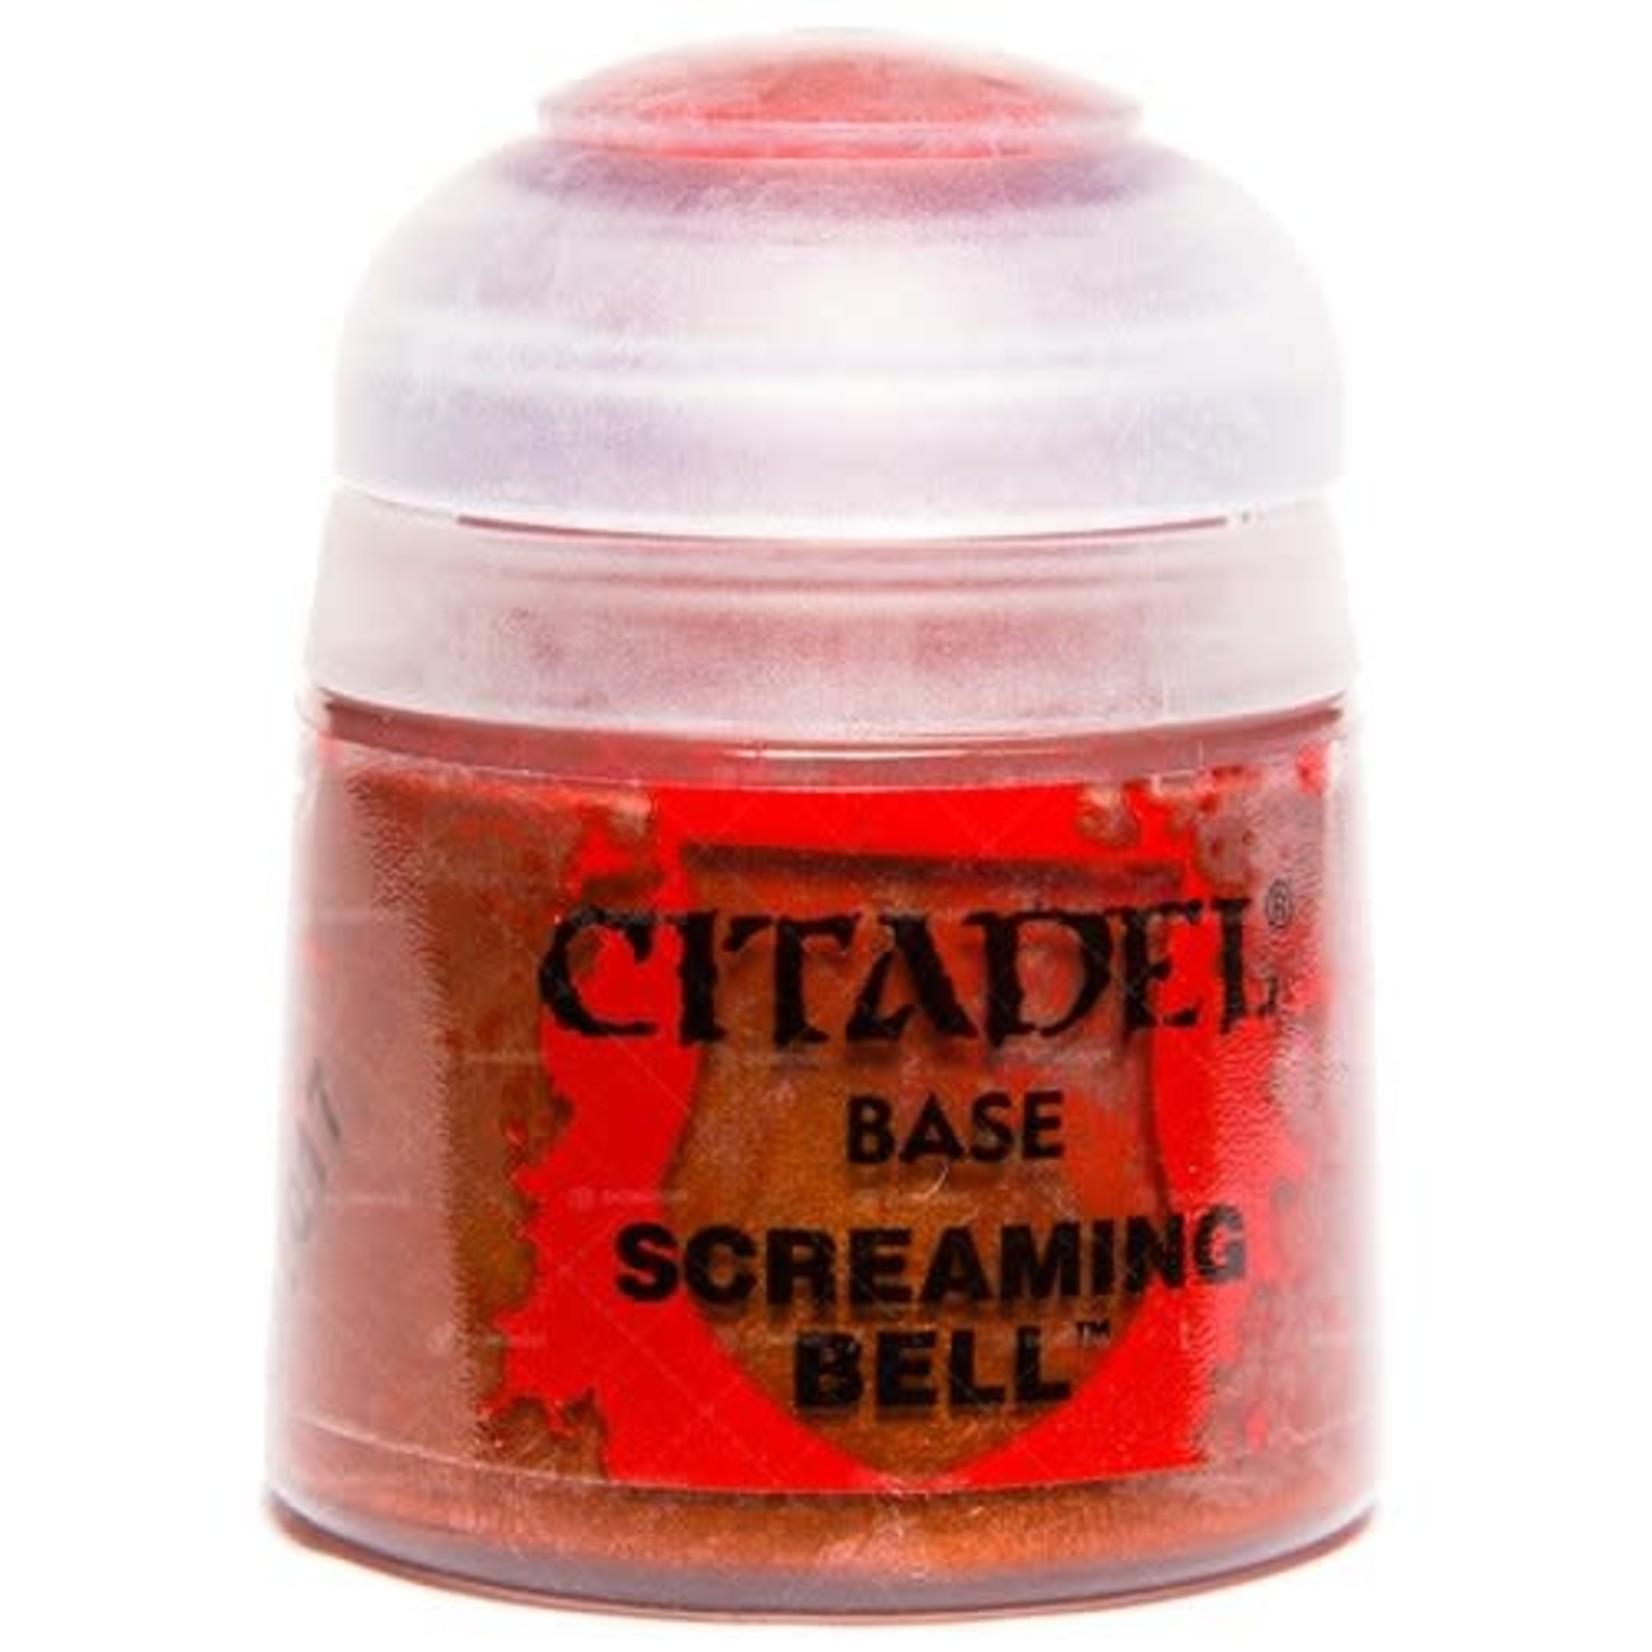 Citadel Citadel Paint - Base: Screaming Bell